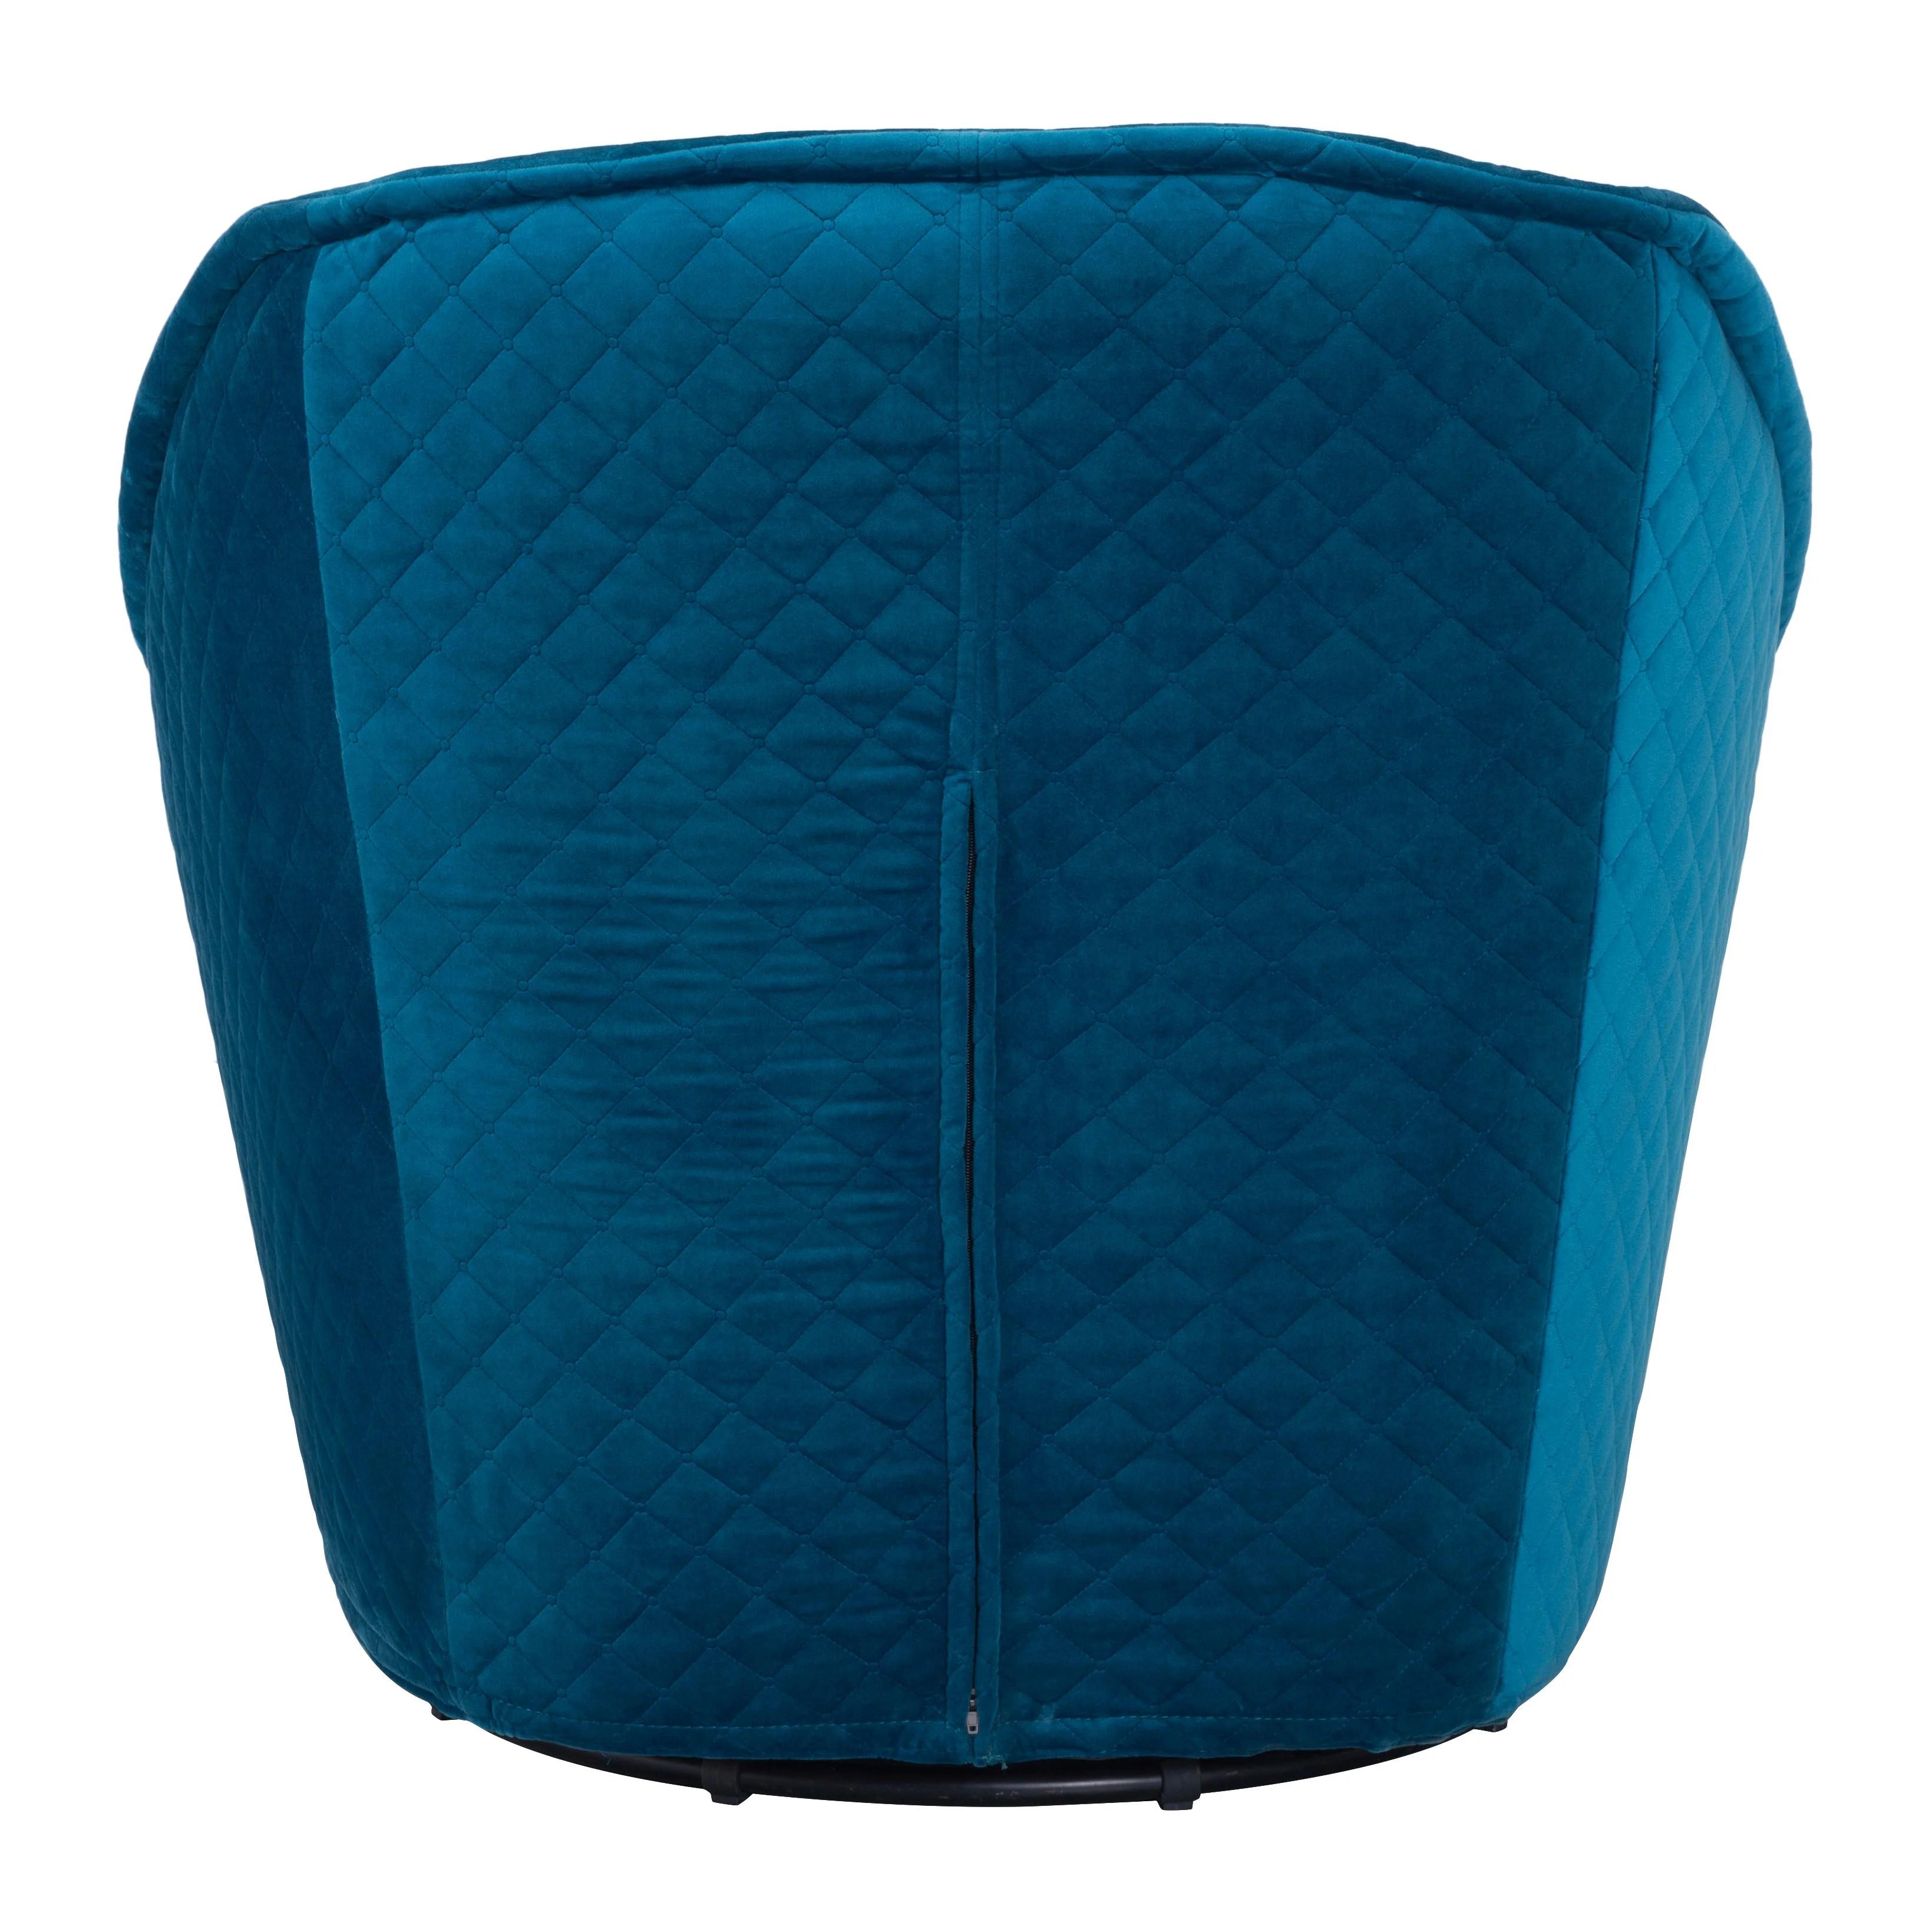 quilted swivel chair step stool retro mercer41 roberdeau barrel wayfair ca